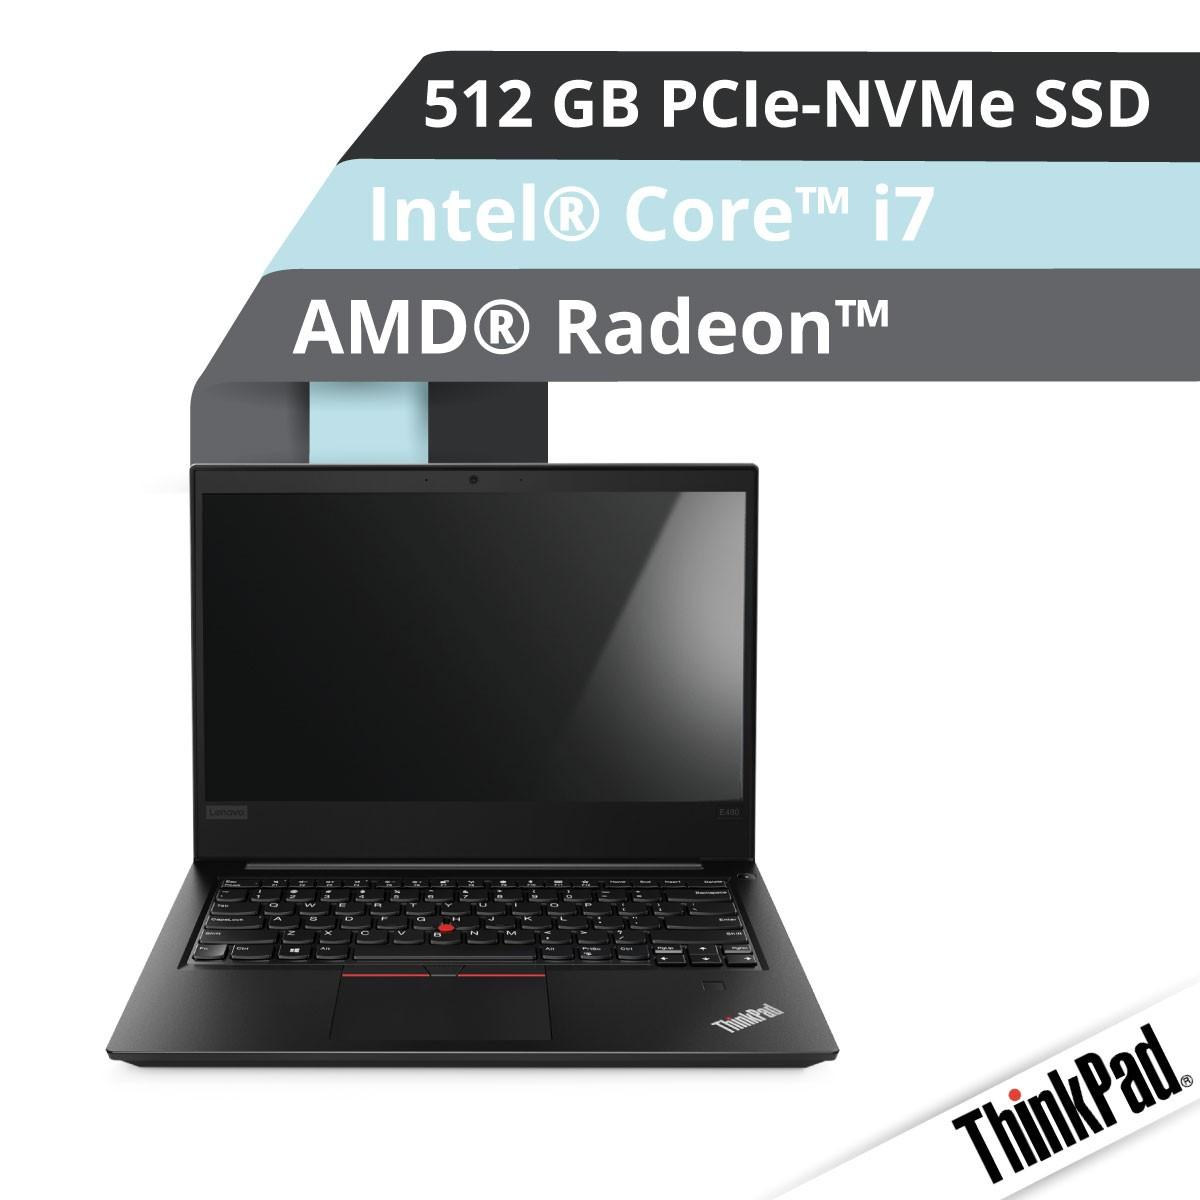 (EOL) Lenovo™ ThinkPad® E480 Notebook Modell 20KQ-S001